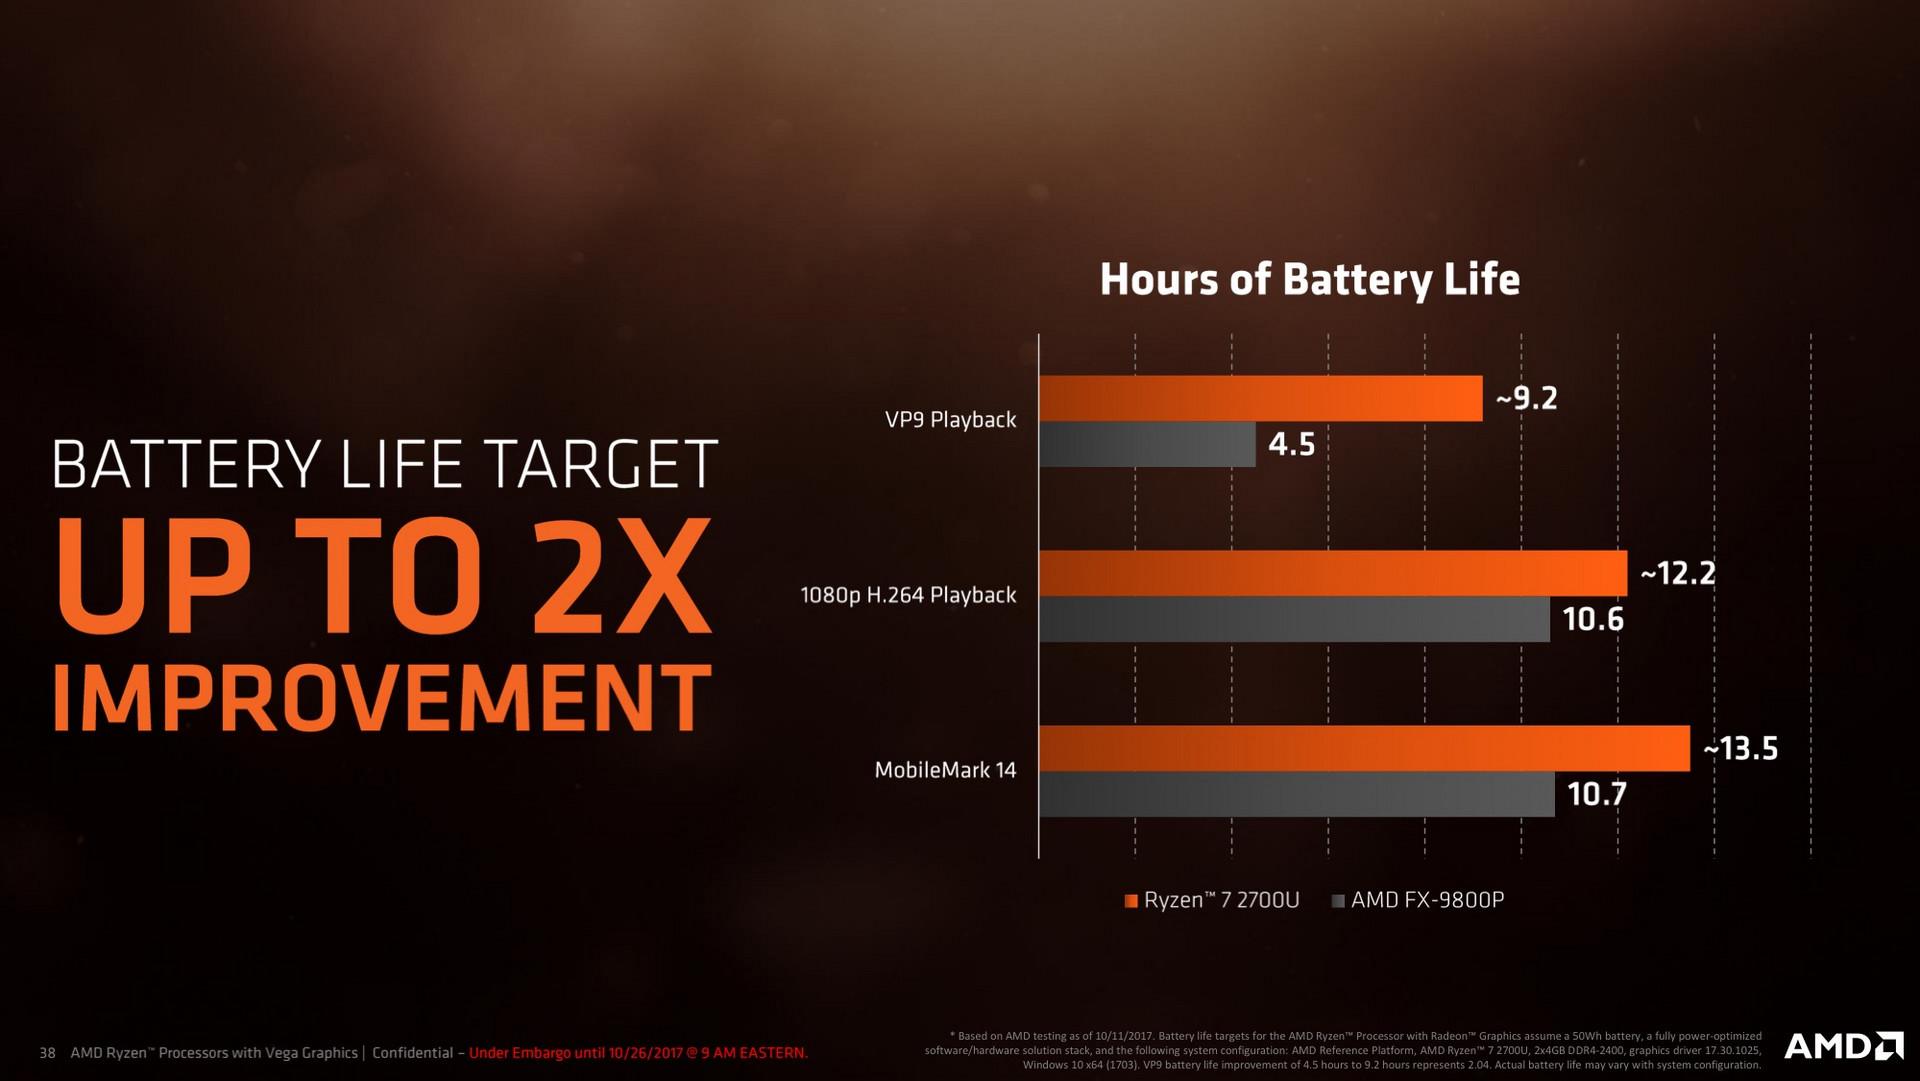 AMD Ryzen Mobile (Raven Ridge) - Back to the Top? - NotebookCheck